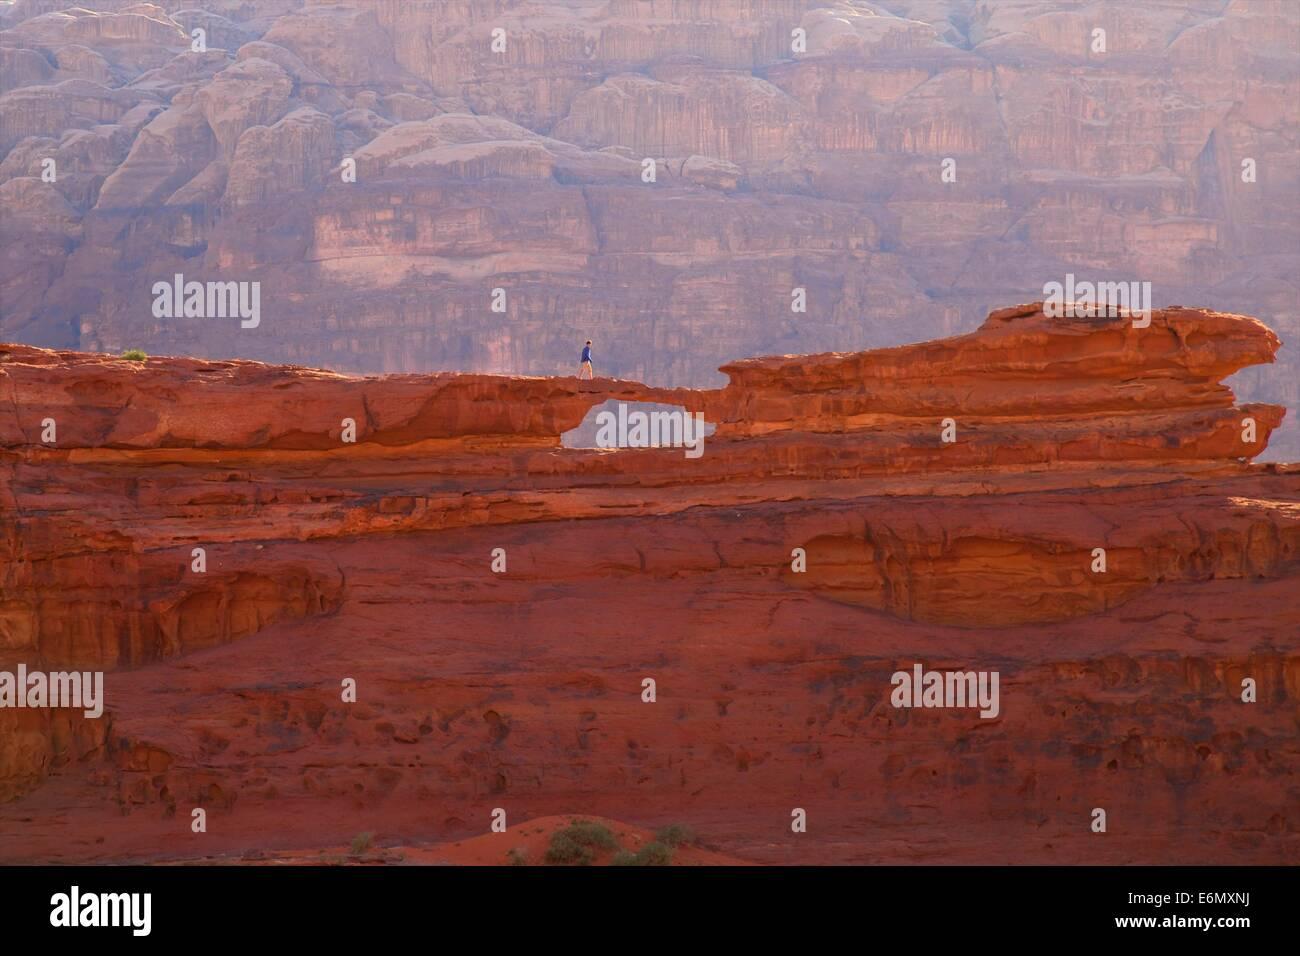 Turista en Wadi Rum, Jordania, Oriente Medio Imagen De Stock